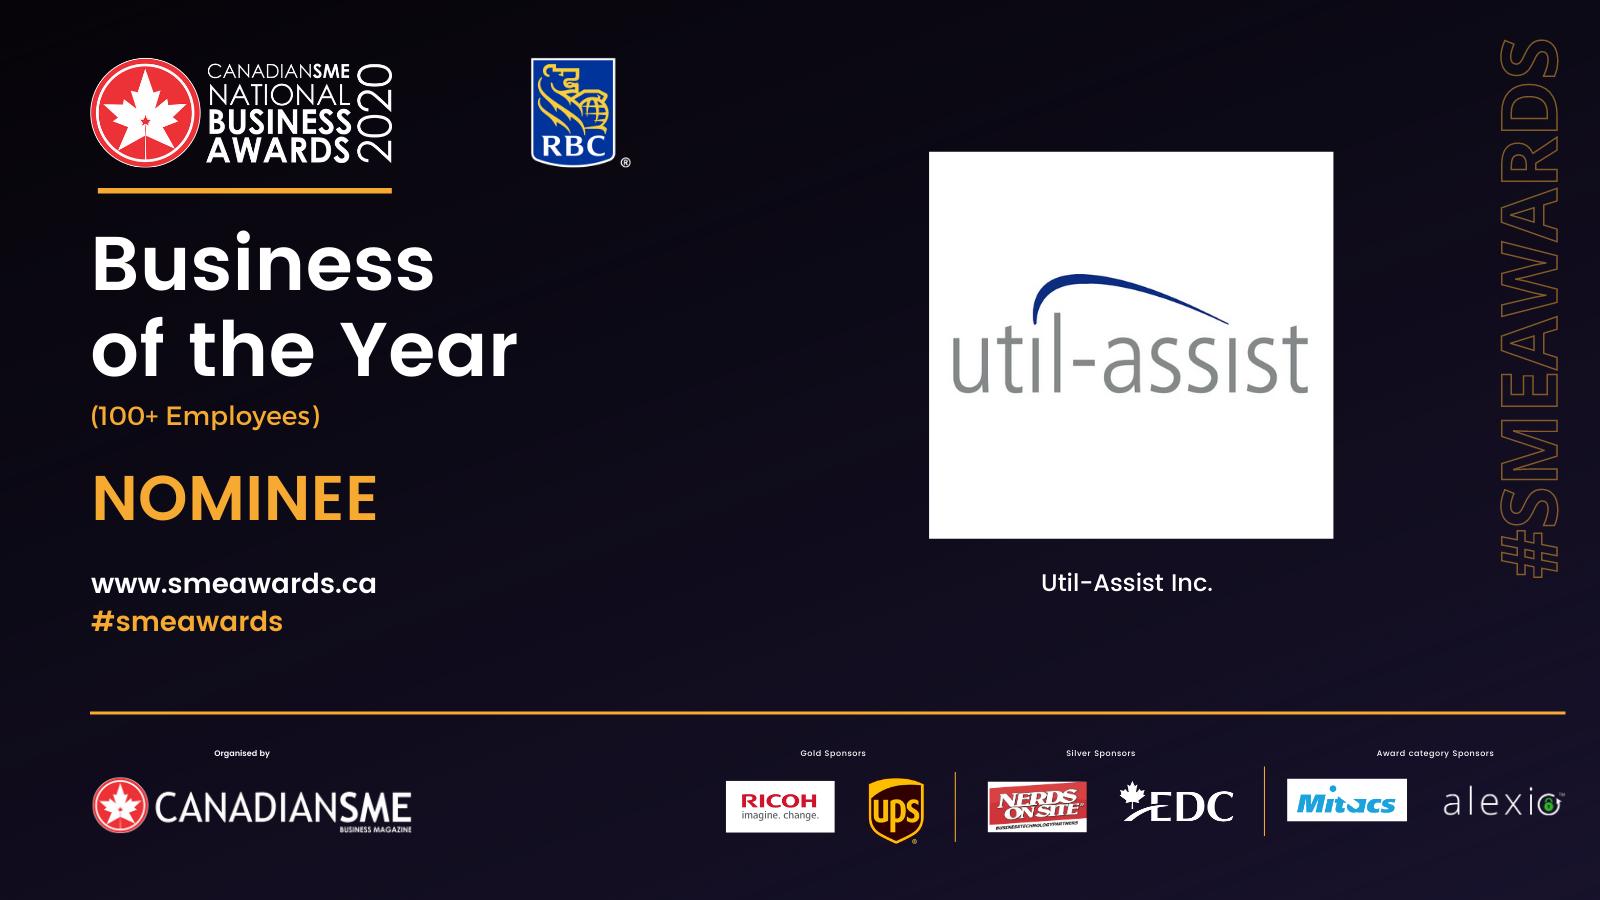 Canadian SME Award Nominee